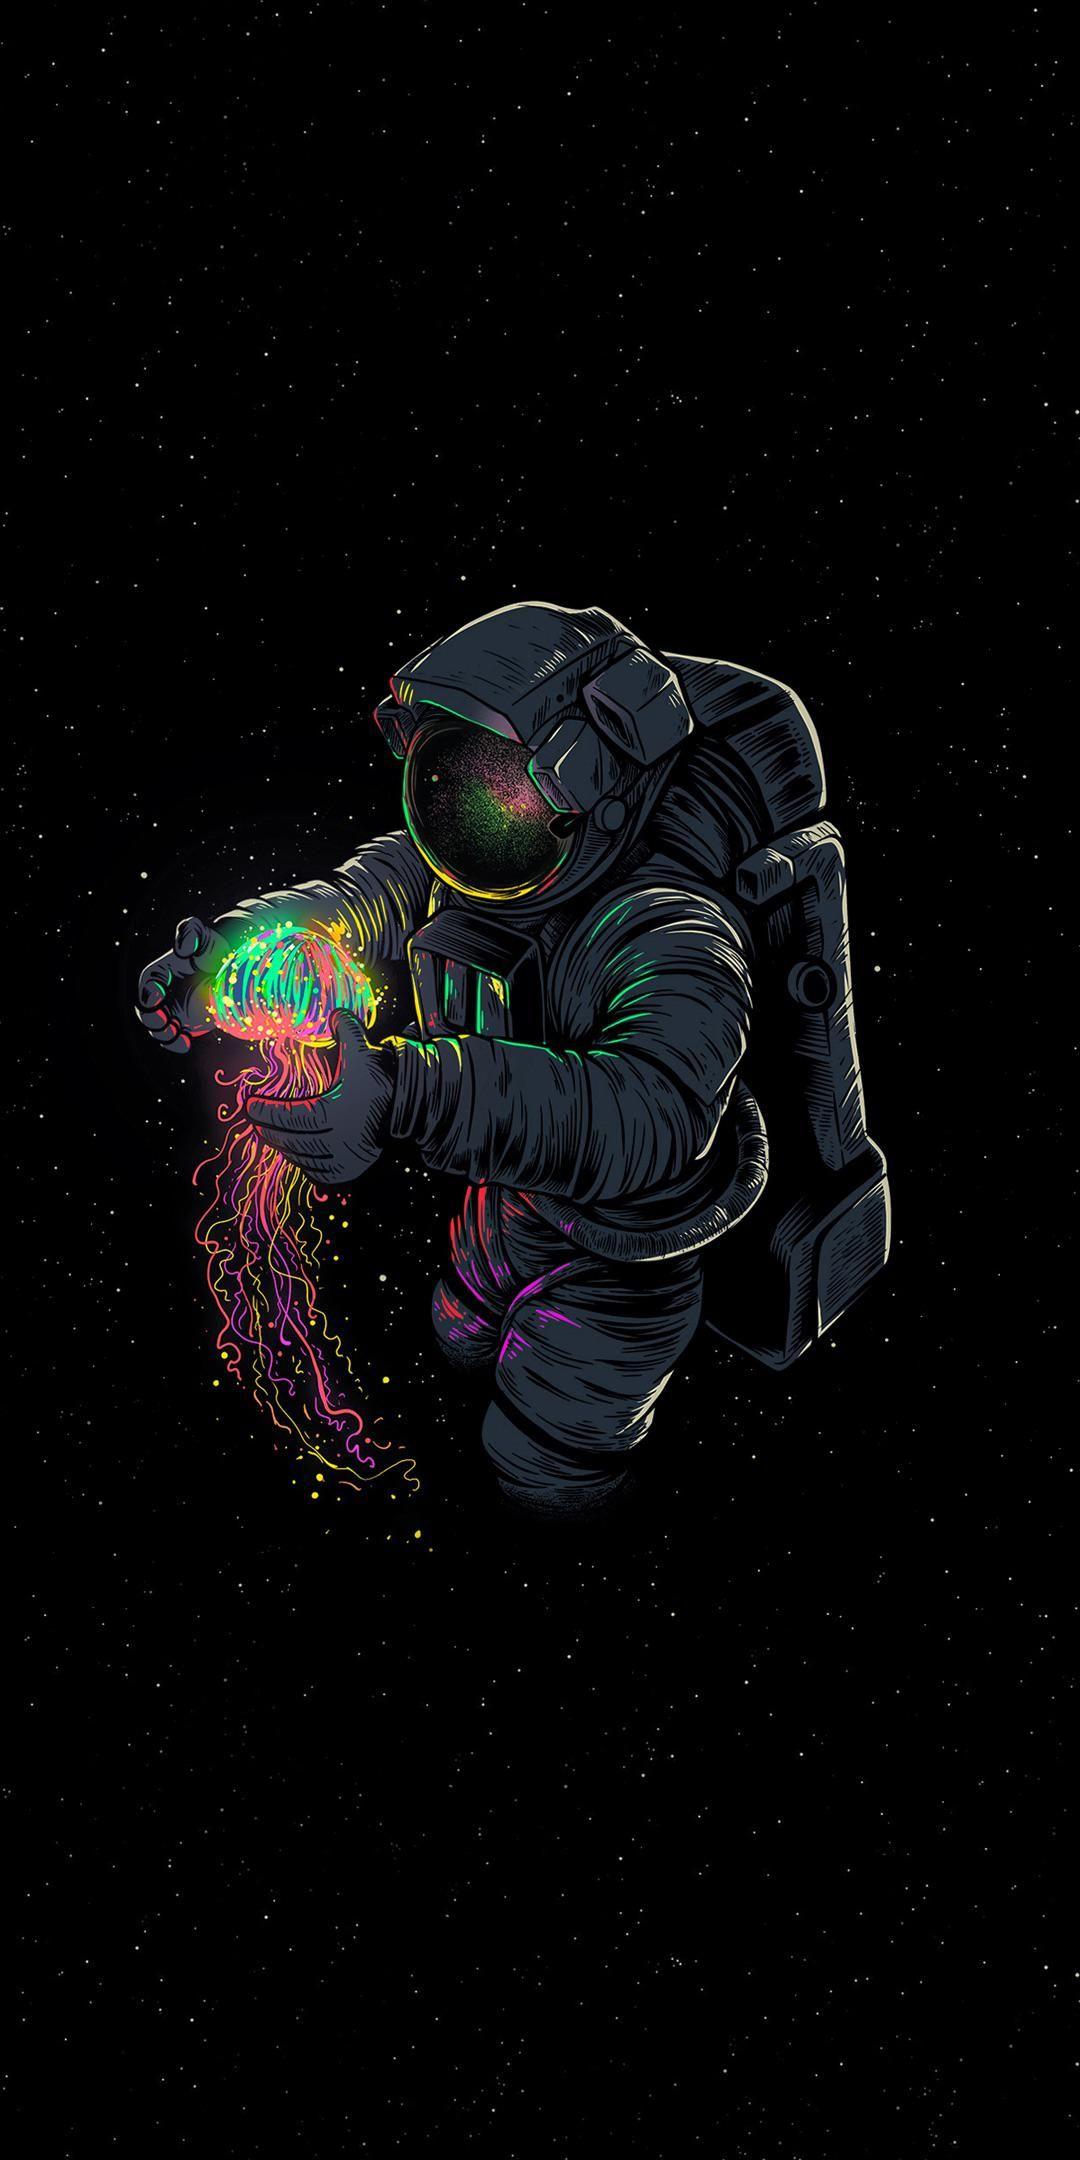 Neon Space Papel De Parede De Astronauta Papel De Parede Com Fundo Preto Papel De Parede Wallpaper